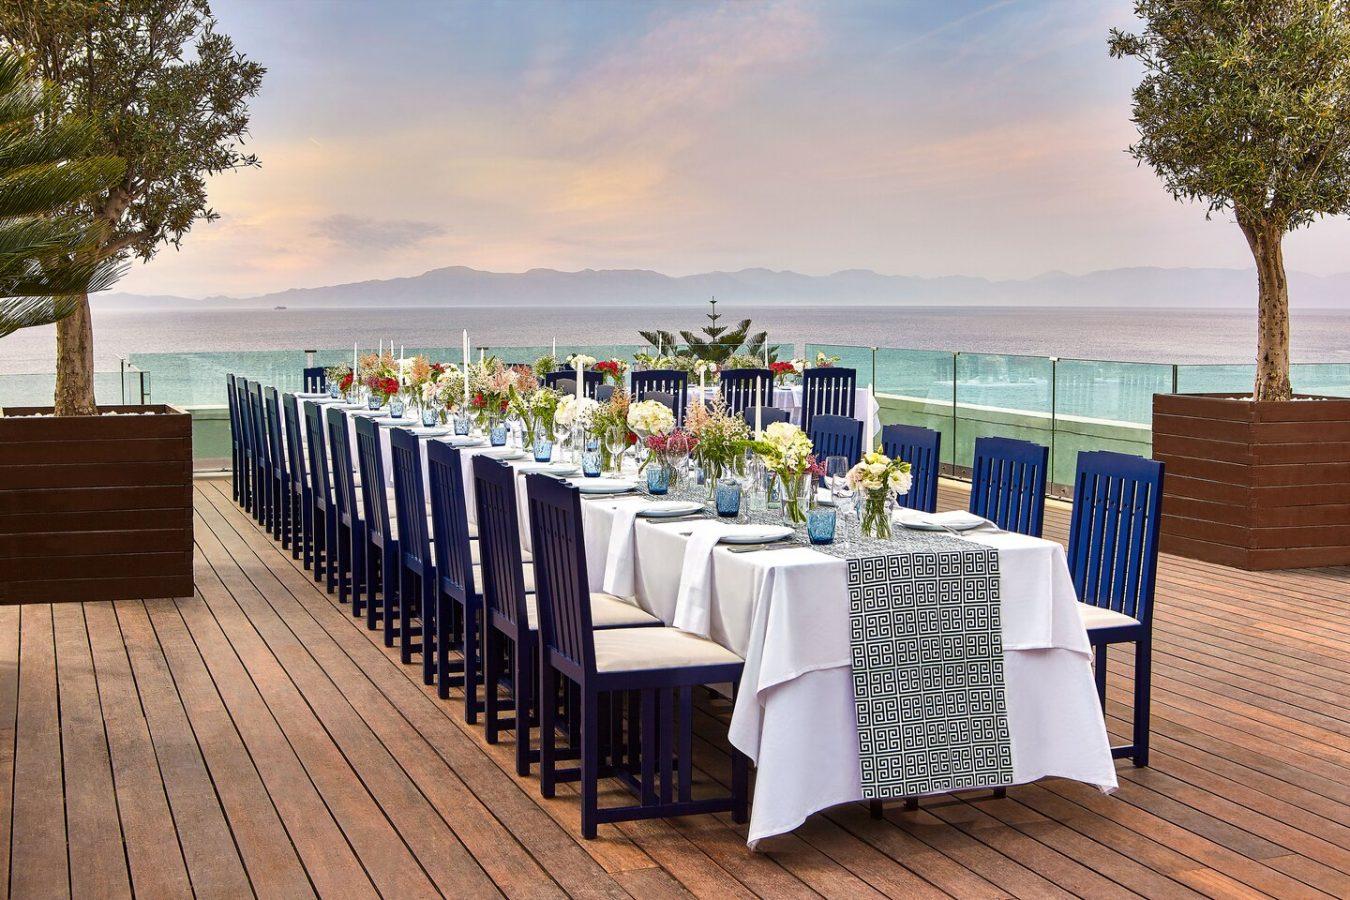 Sheraton Rhodes Resort 6th floor deck